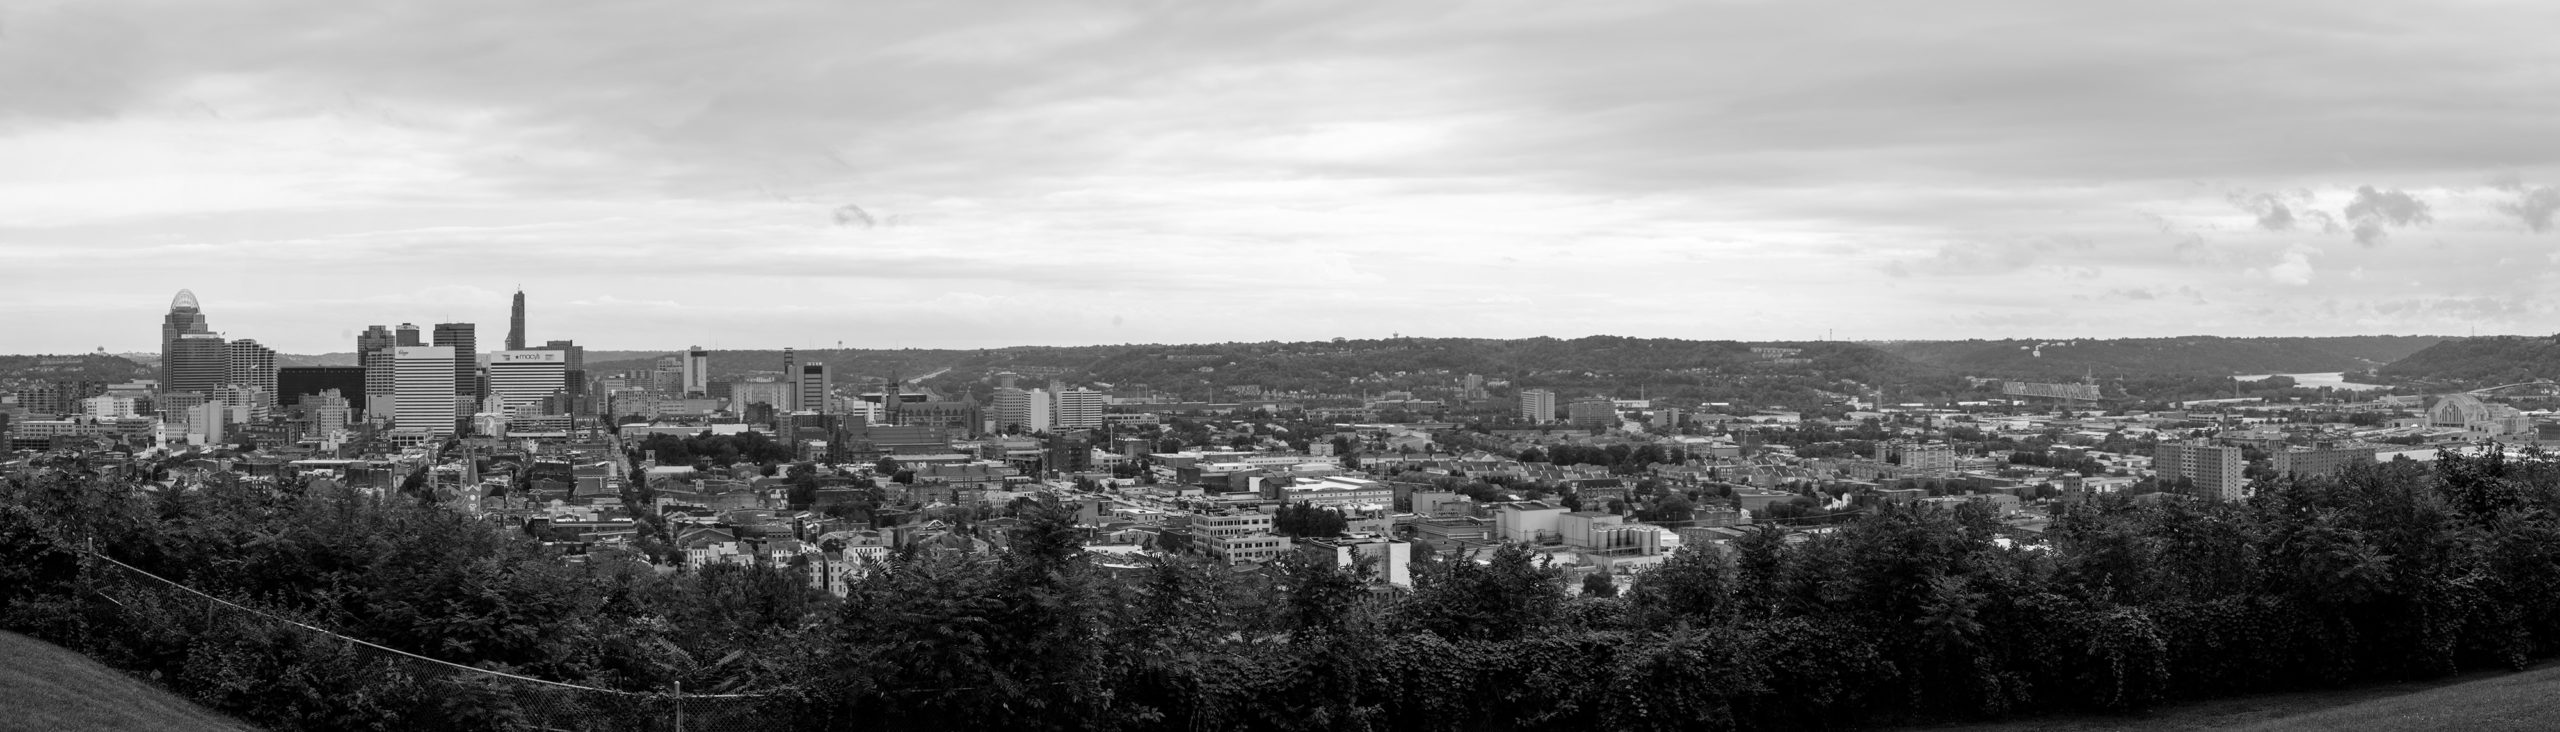 Bellevue Hill view of CIncinnati panorama